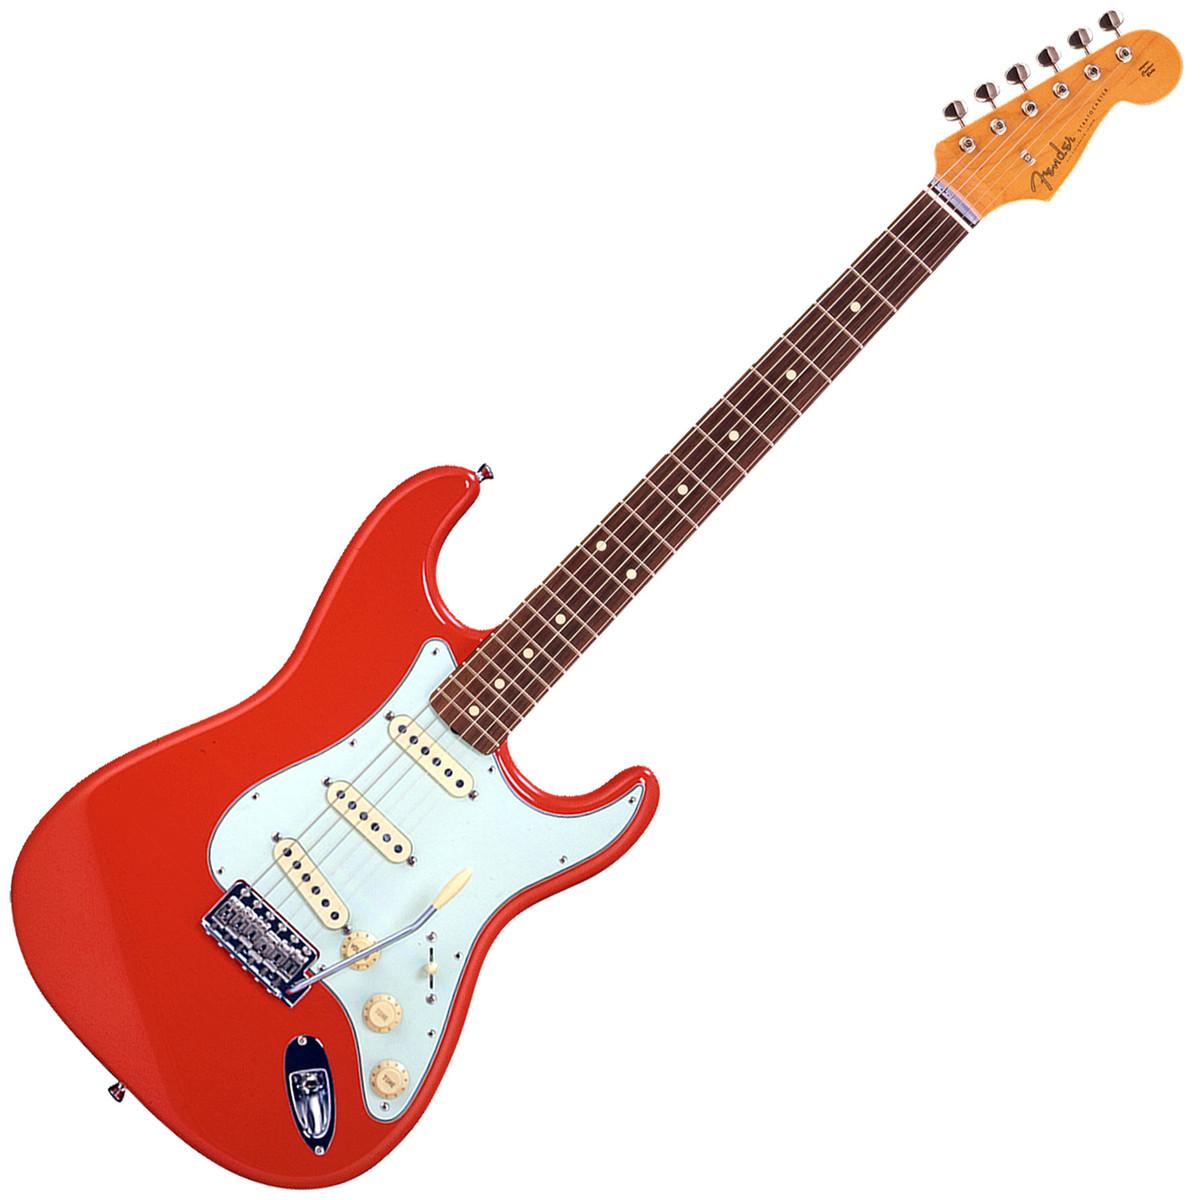 disc fender fsr classic 39 60s stratocaster fiesta red at gear4music. Black Bedroom Furniture Sets. Home Design Ideas